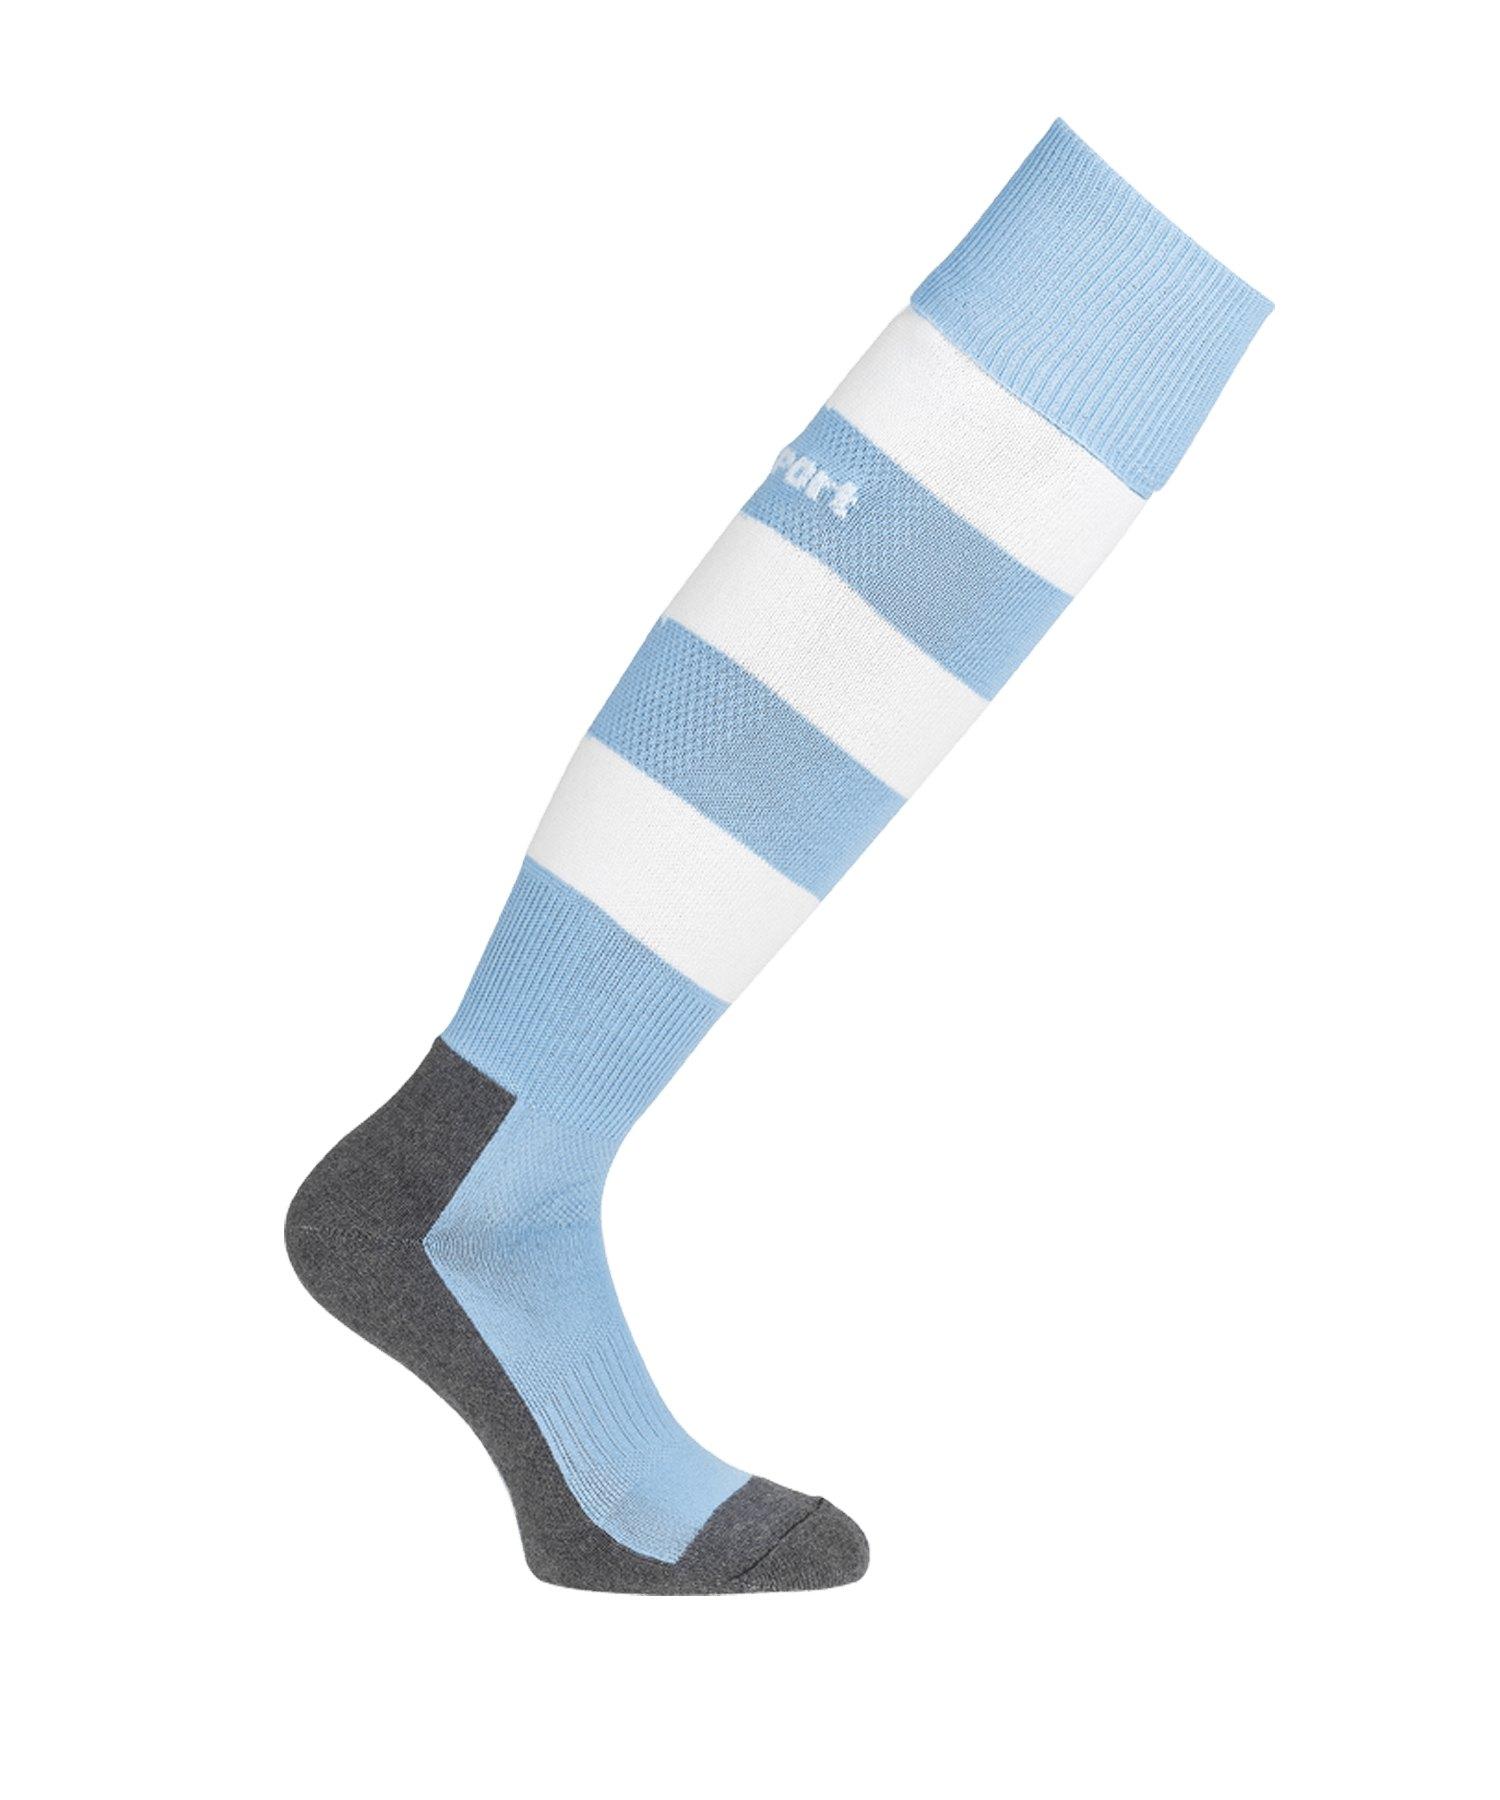 Uhlsport Team Pro Stripe Stutzenstrumpf Blau F08 - blau